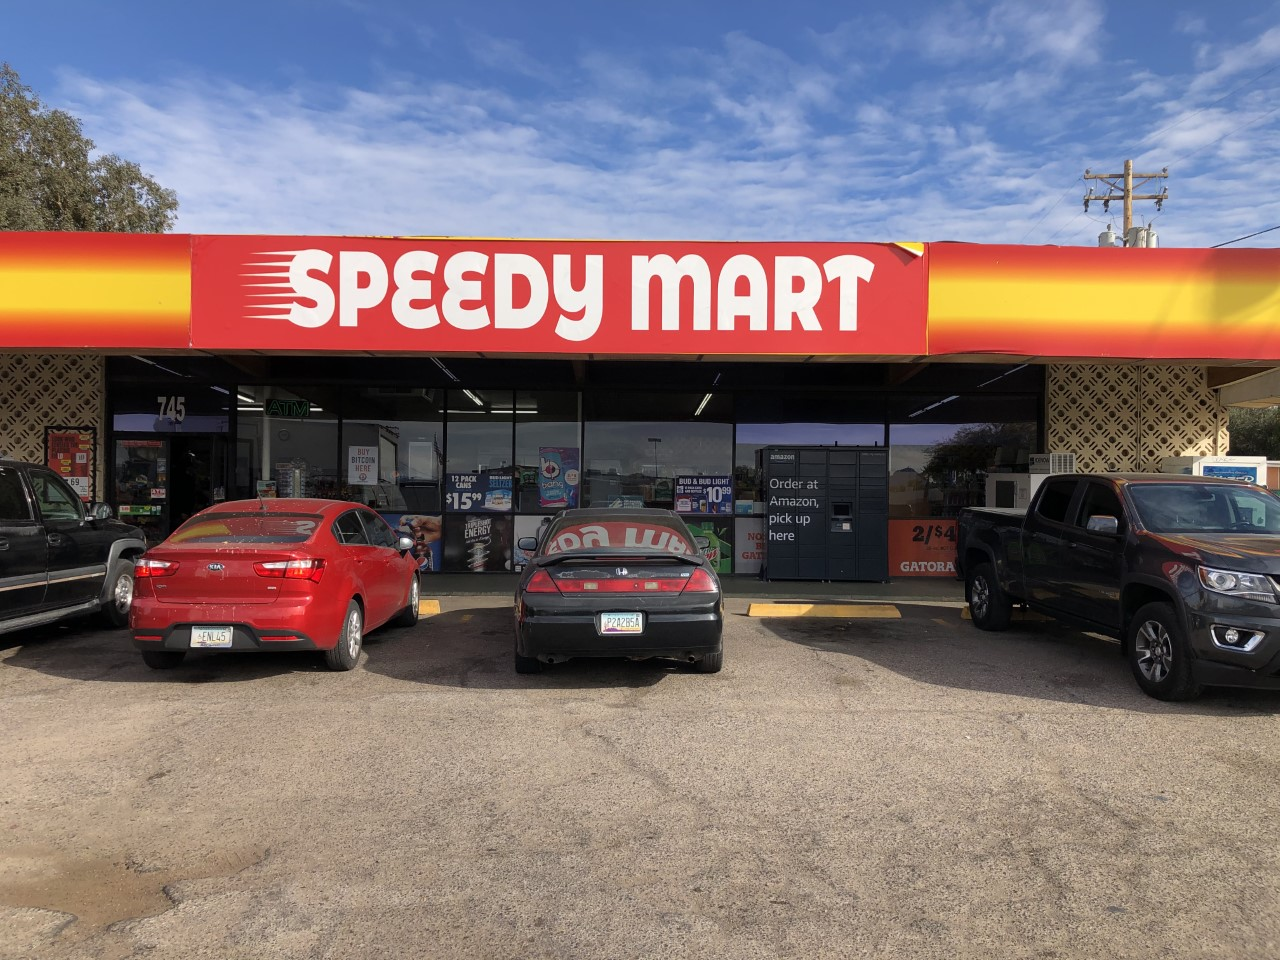 Speedy Mart